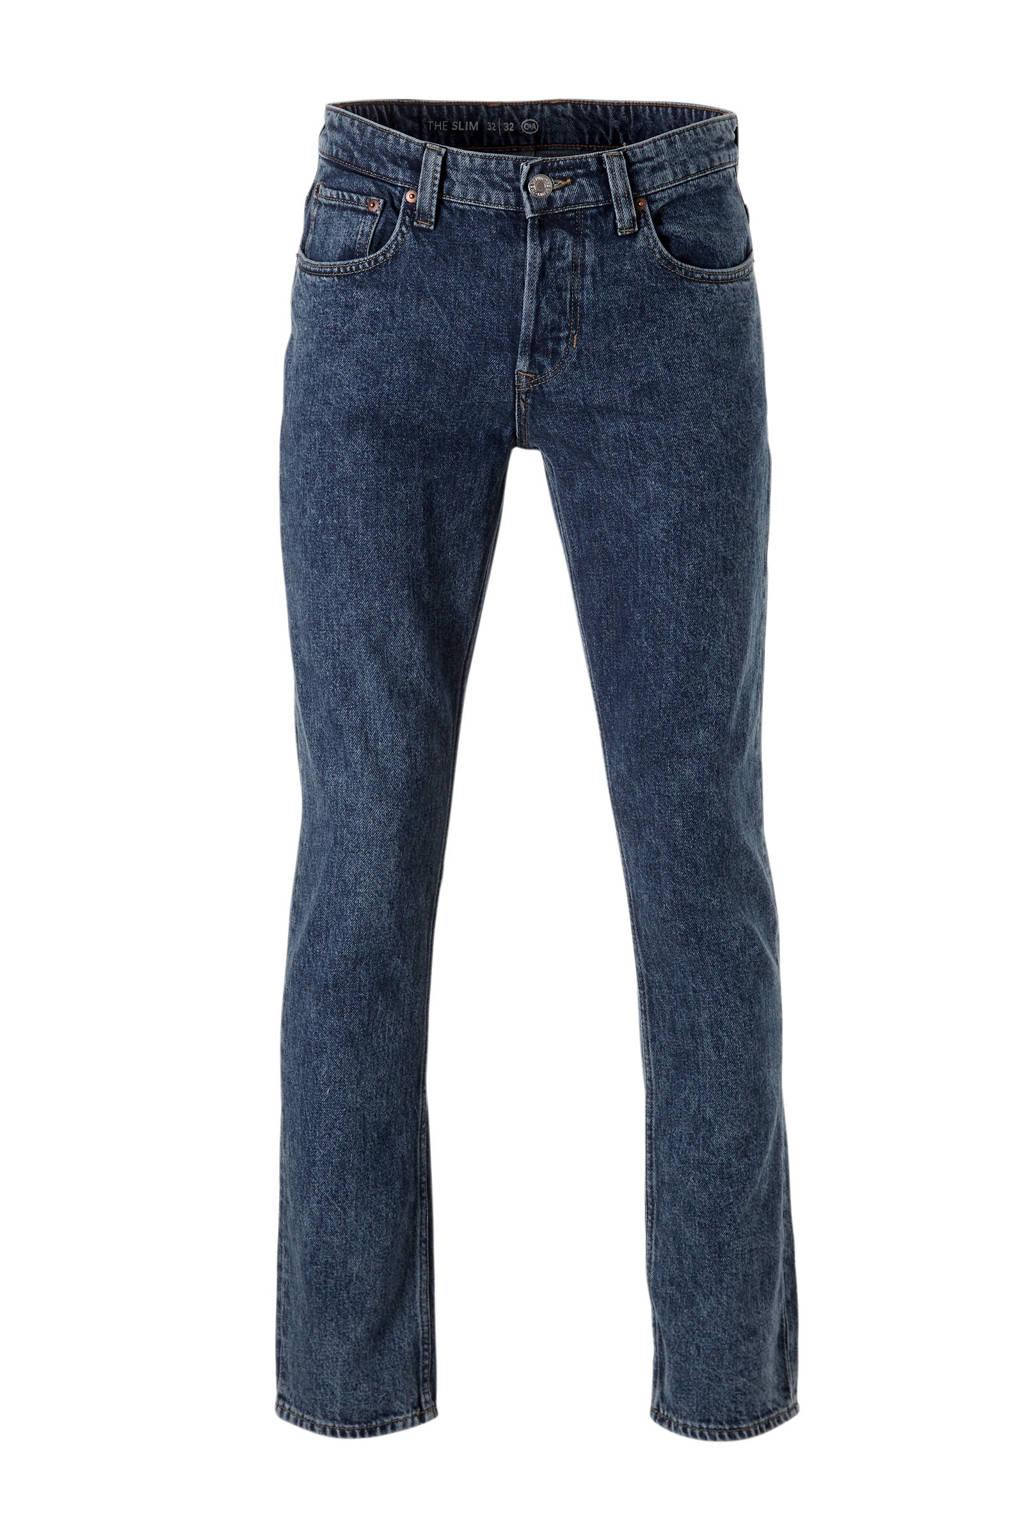 C&A The Denim slim fit jeans, Blauw